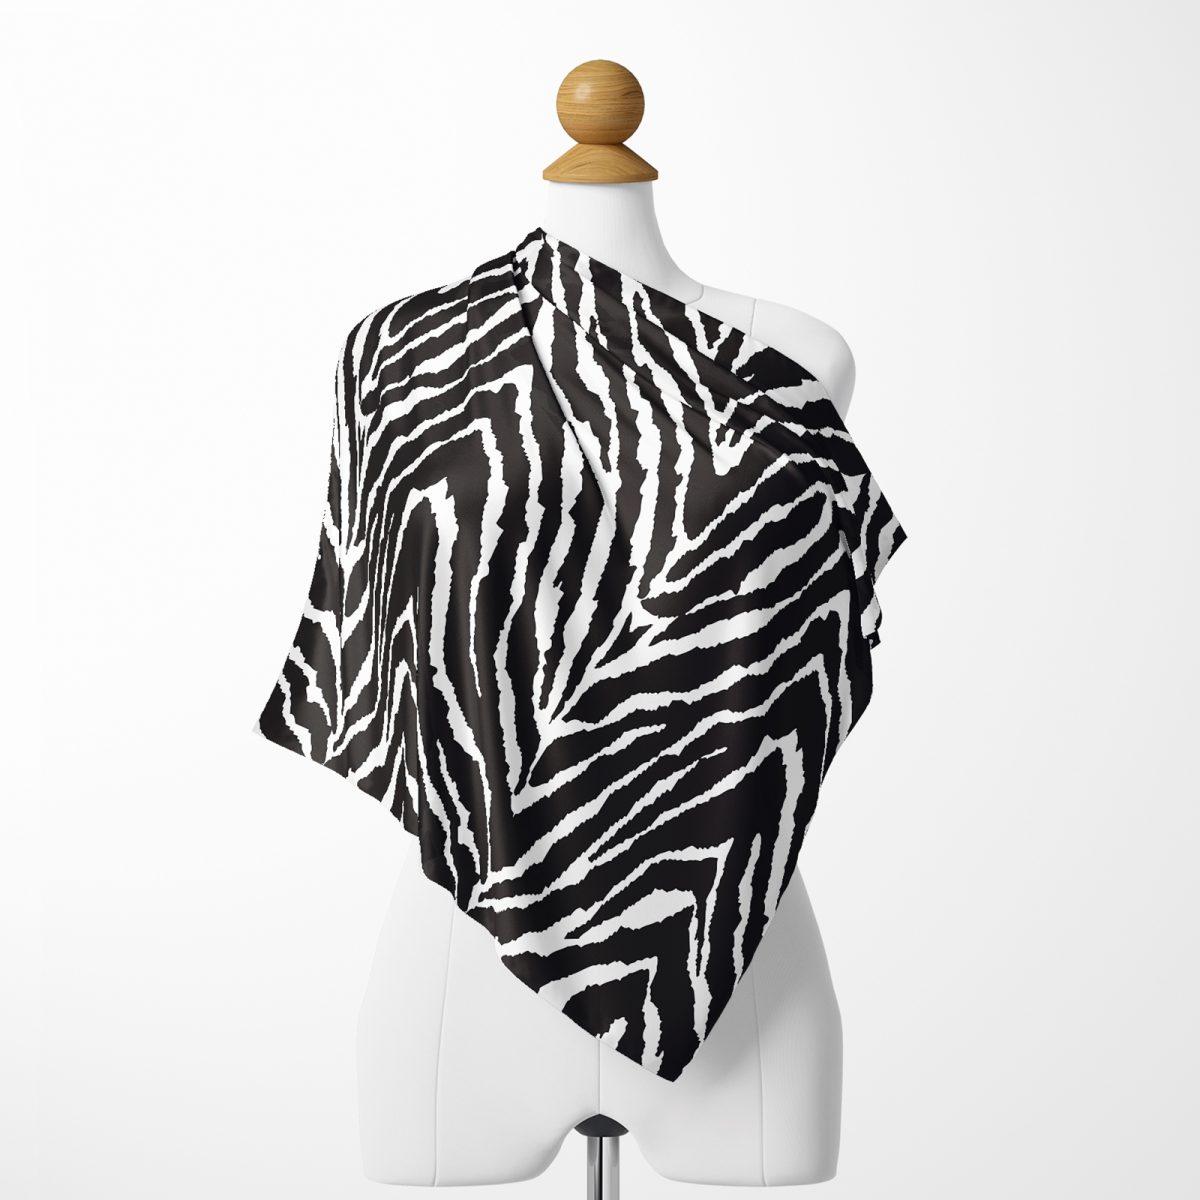 Realhomes Zebra Desenlii Özel Tasarım Dijital Baskılı Modern Tivil Eşarp Realhomes